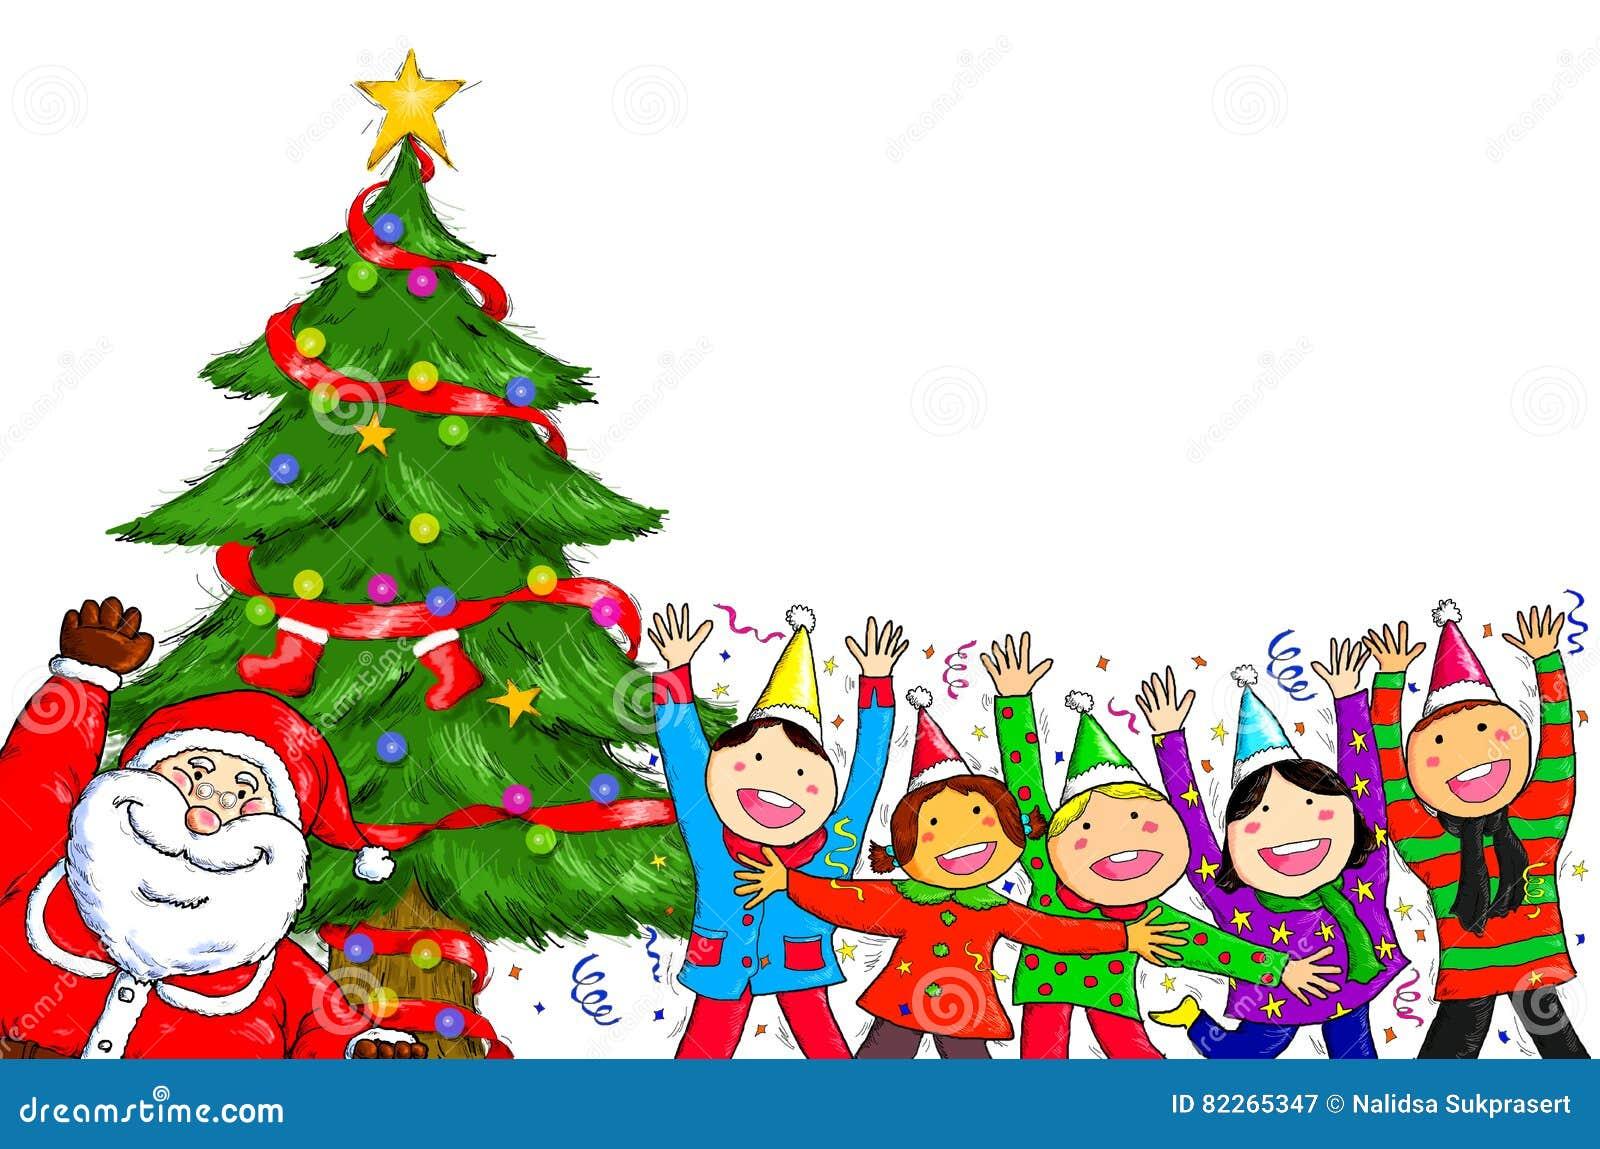 Merry Christmas Santa Claus People Christmas Tree Celebration